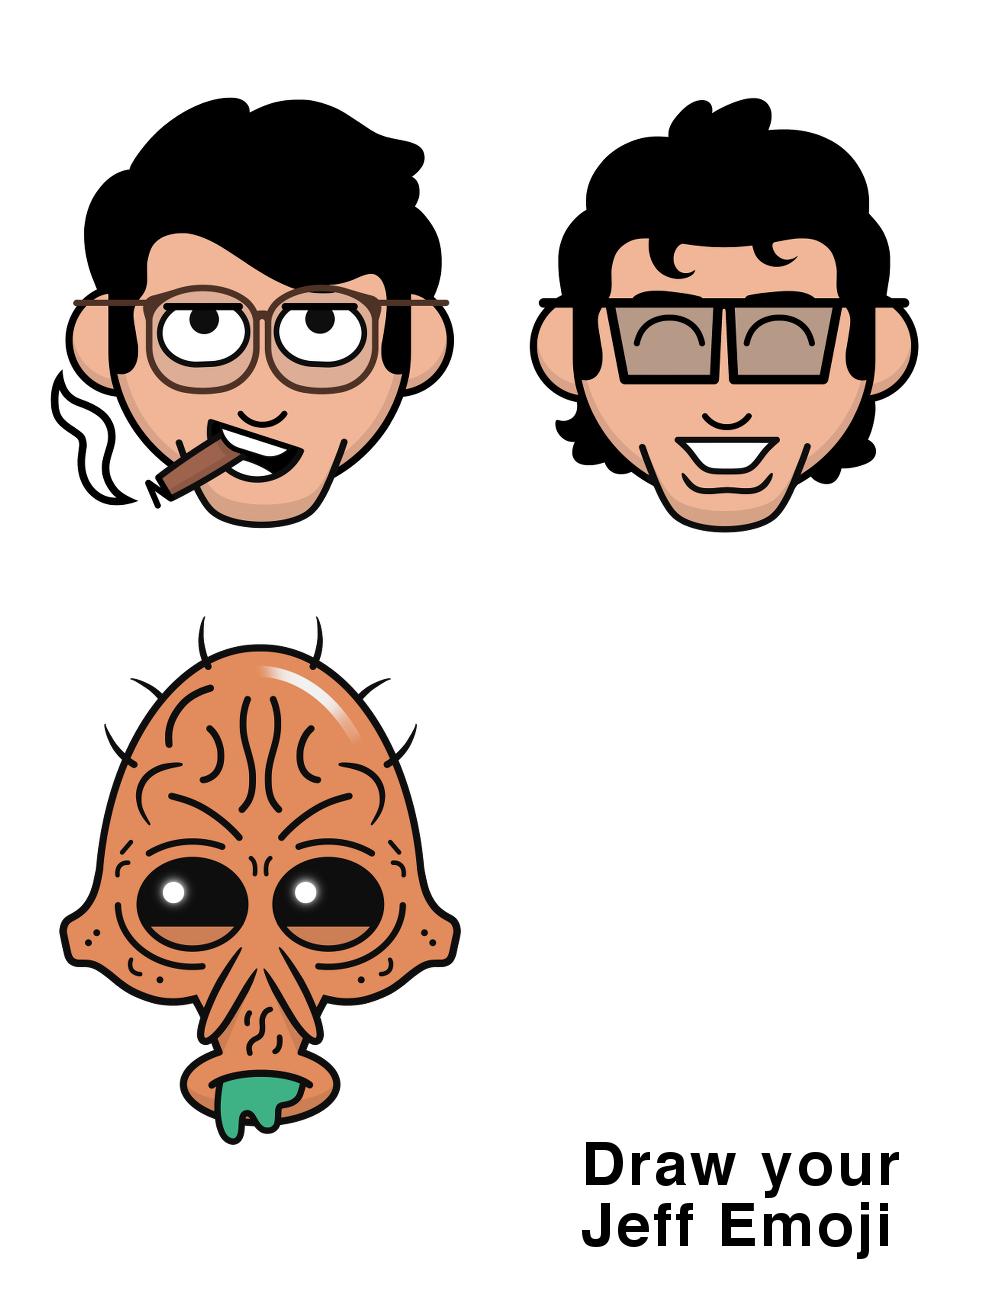 Jeff Emoji's by Dan Woodger